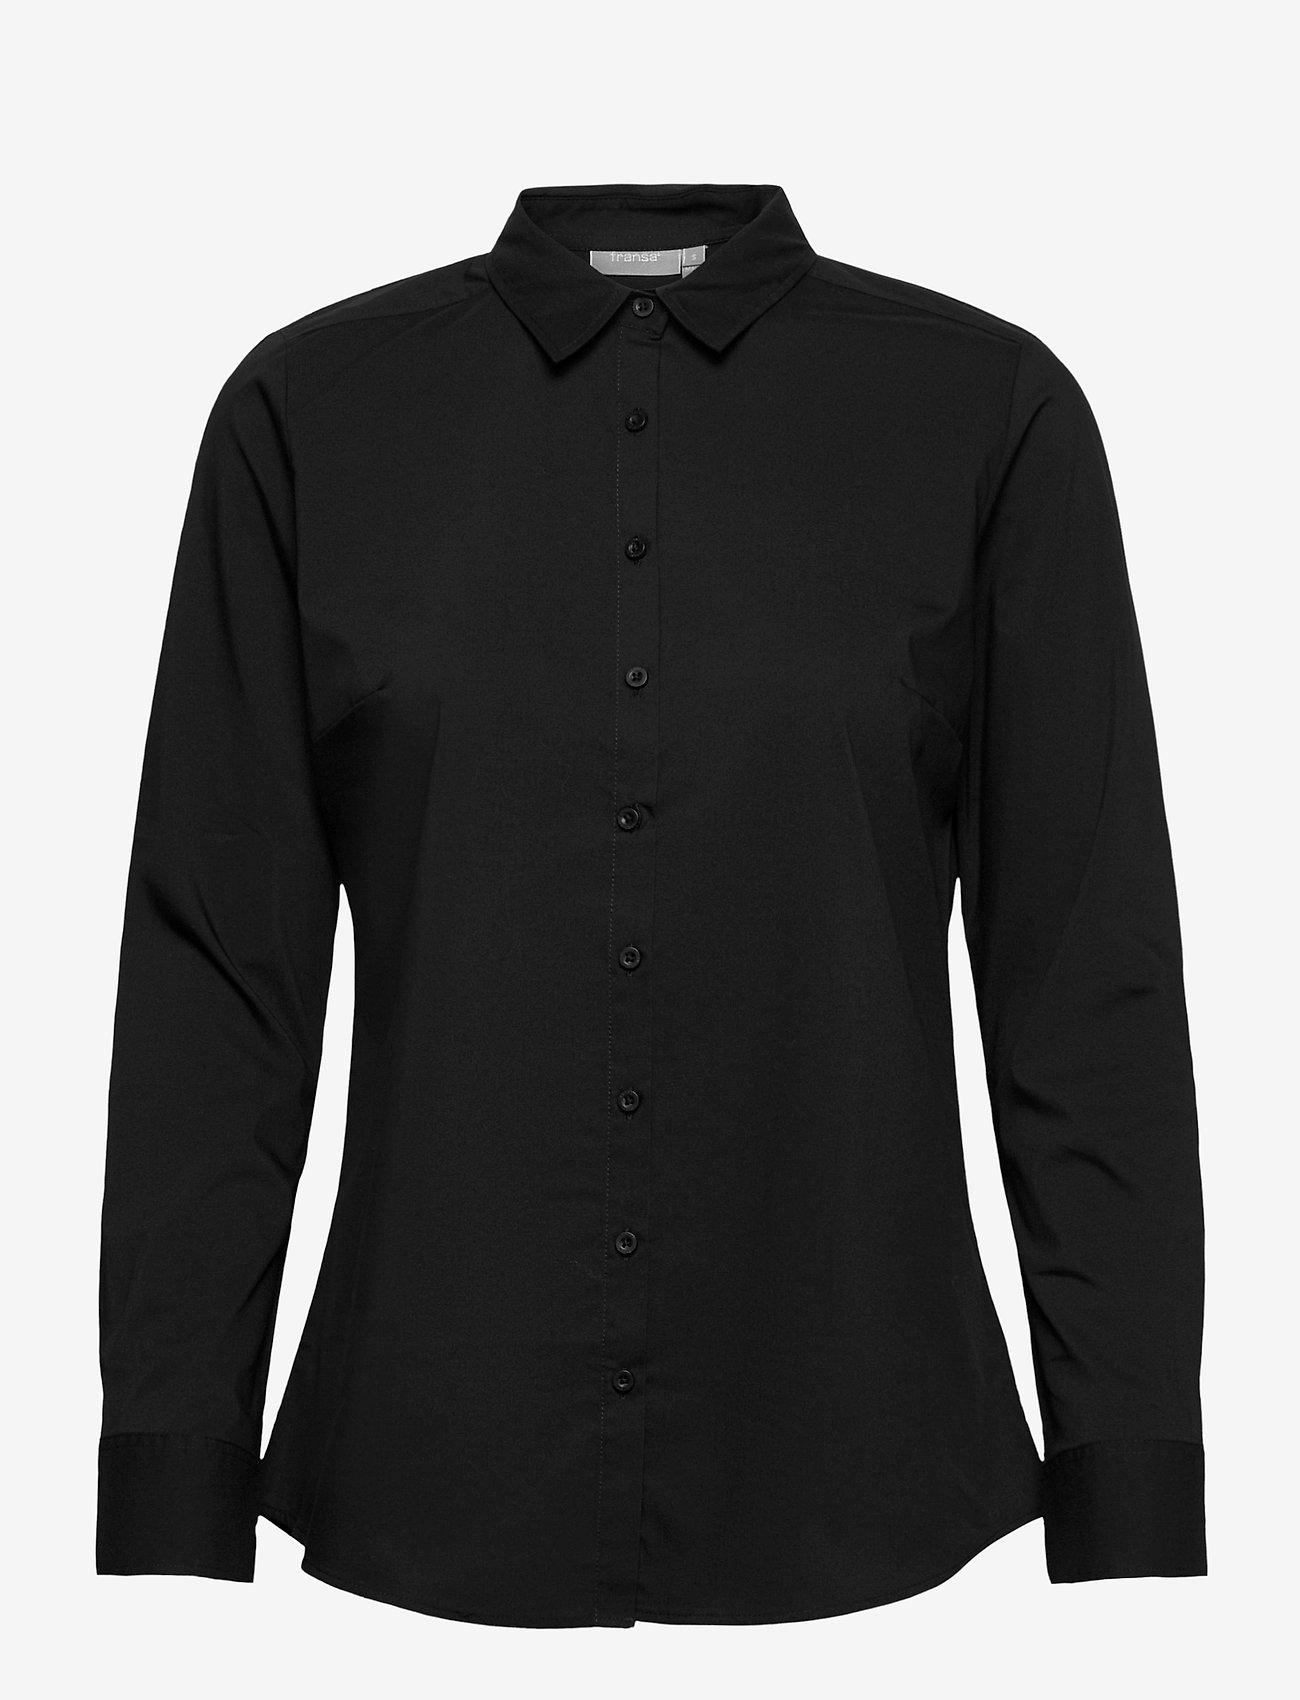 Fransa - Zashirt 1 Shirt - pitkähihaiset paidat - black - 0